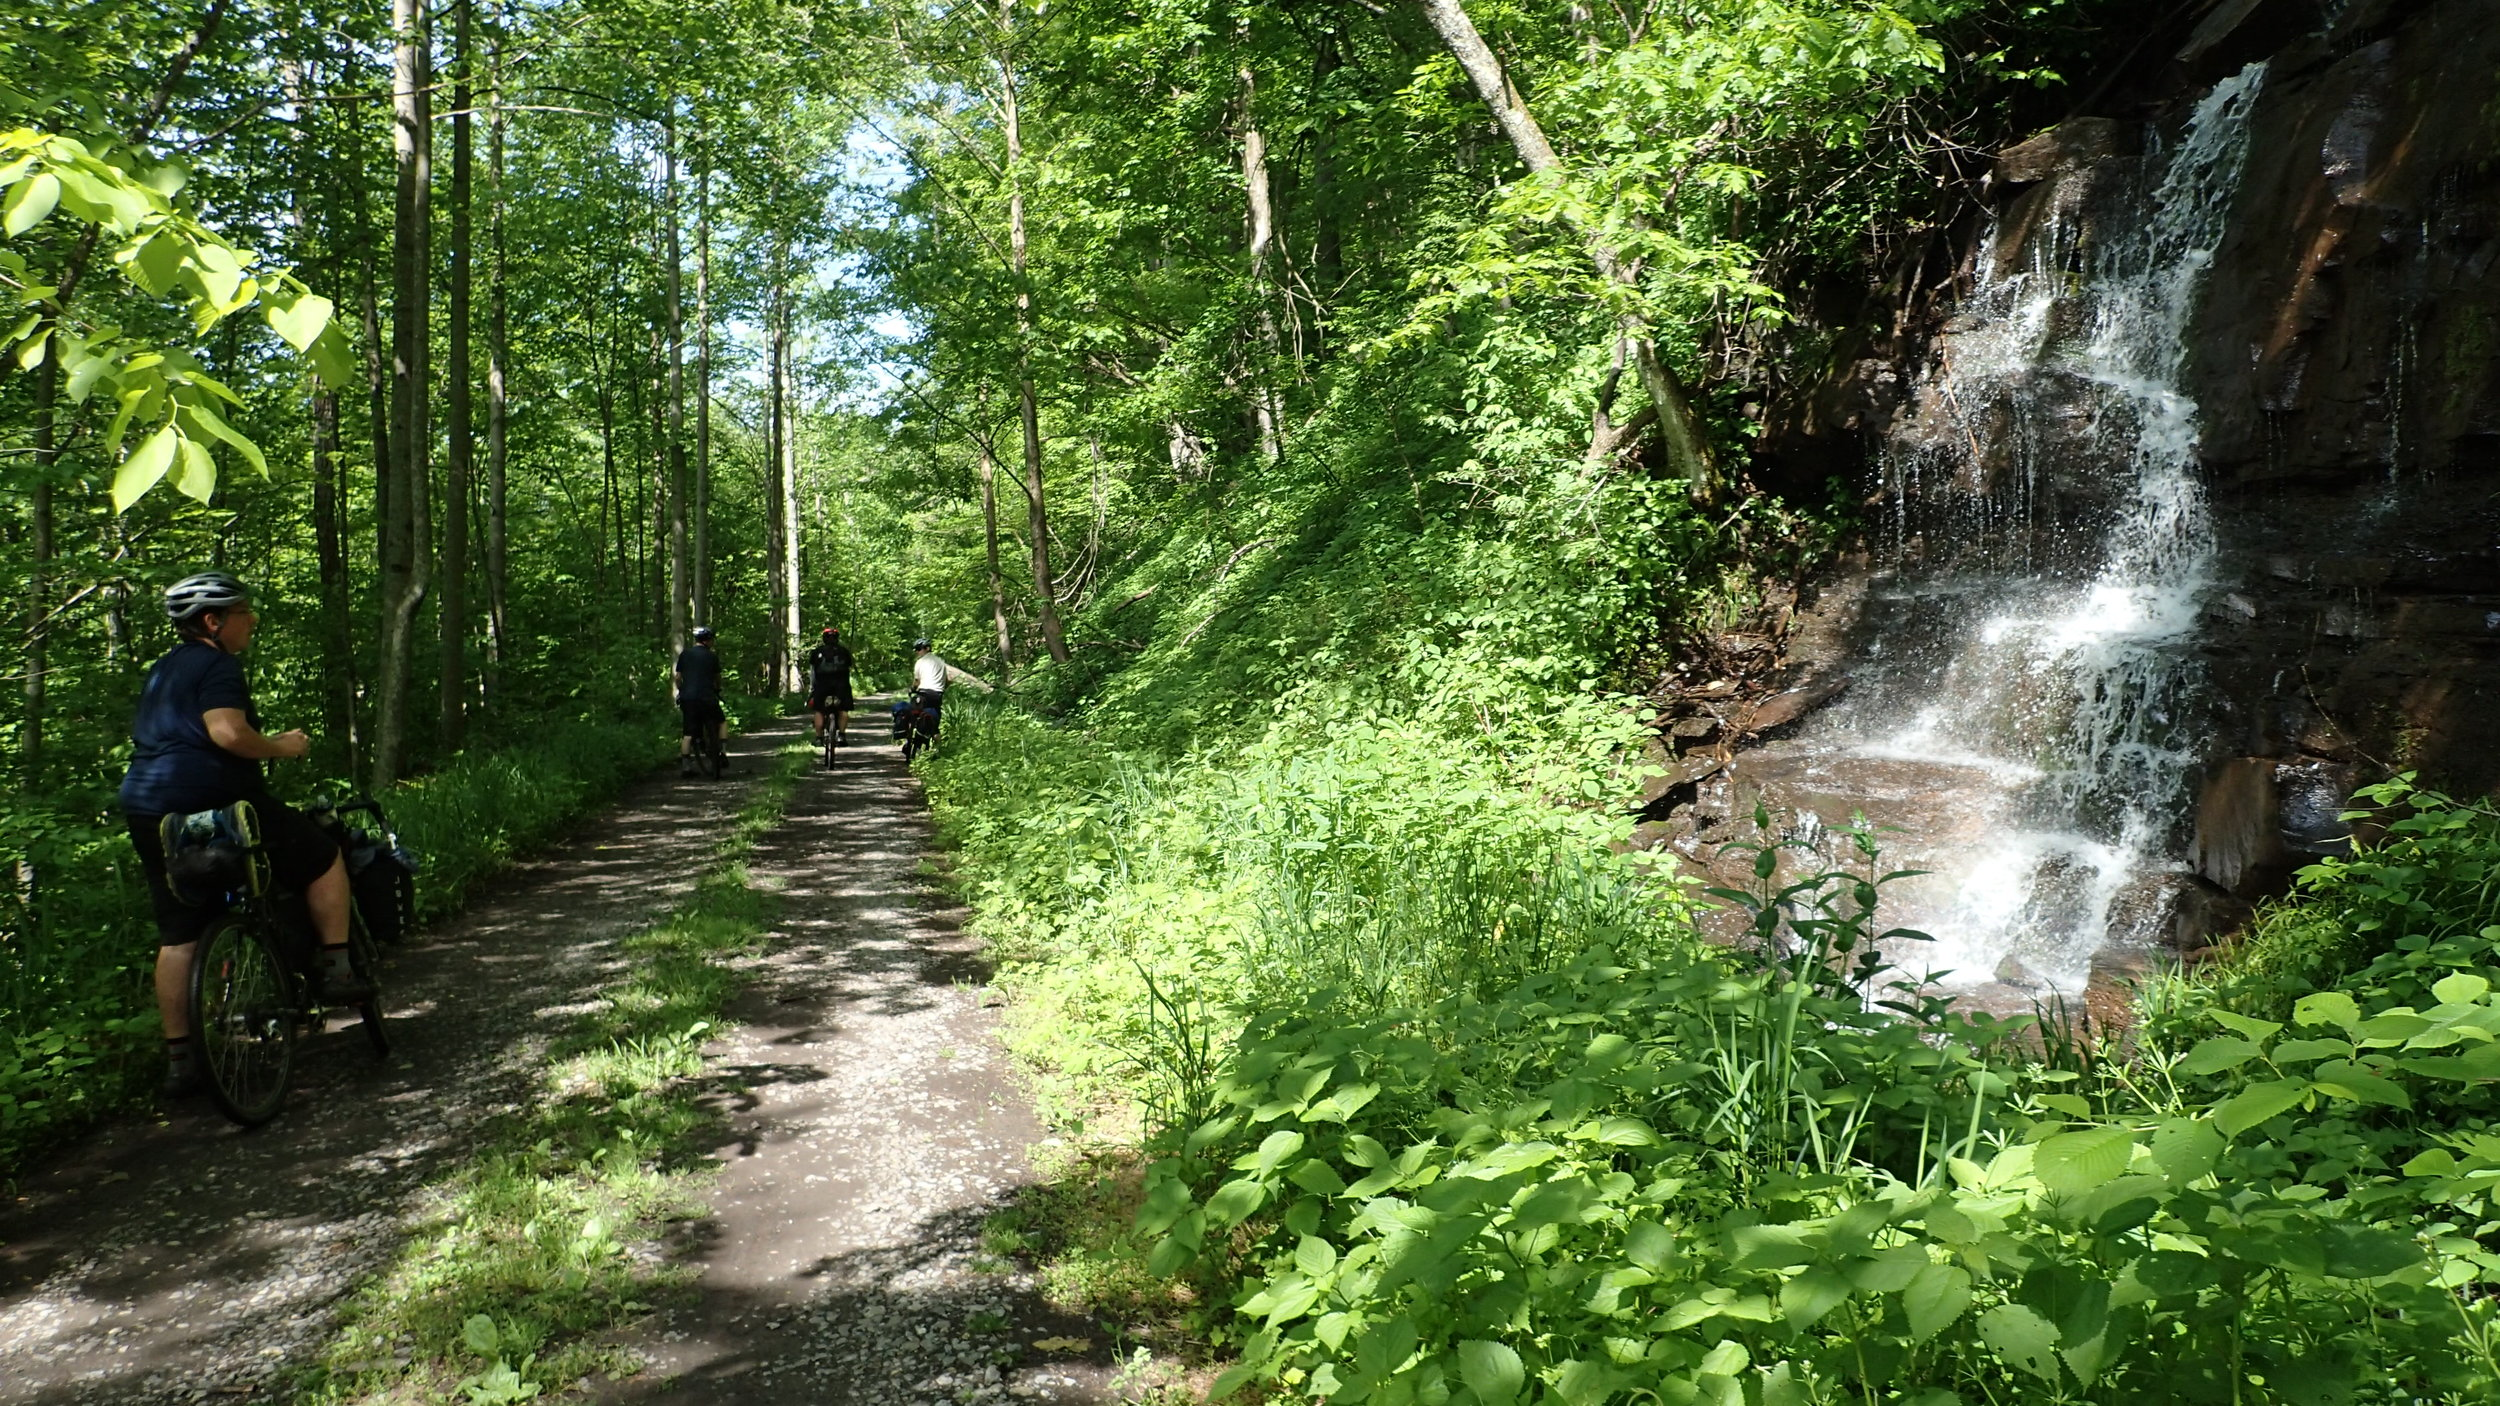 Blackwater Canyon Trail